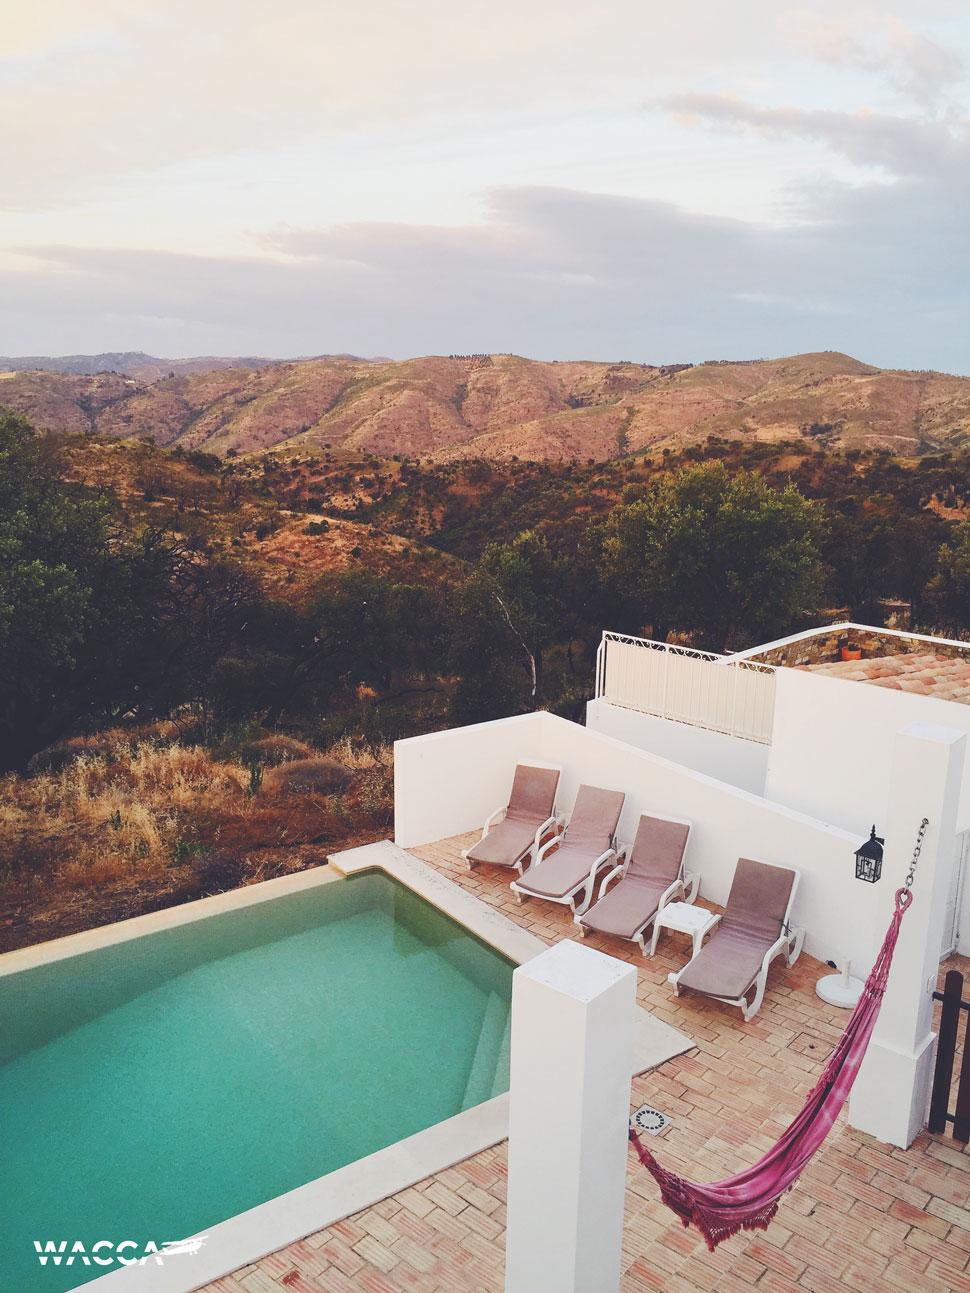 airbnb-algarve-wacca-01